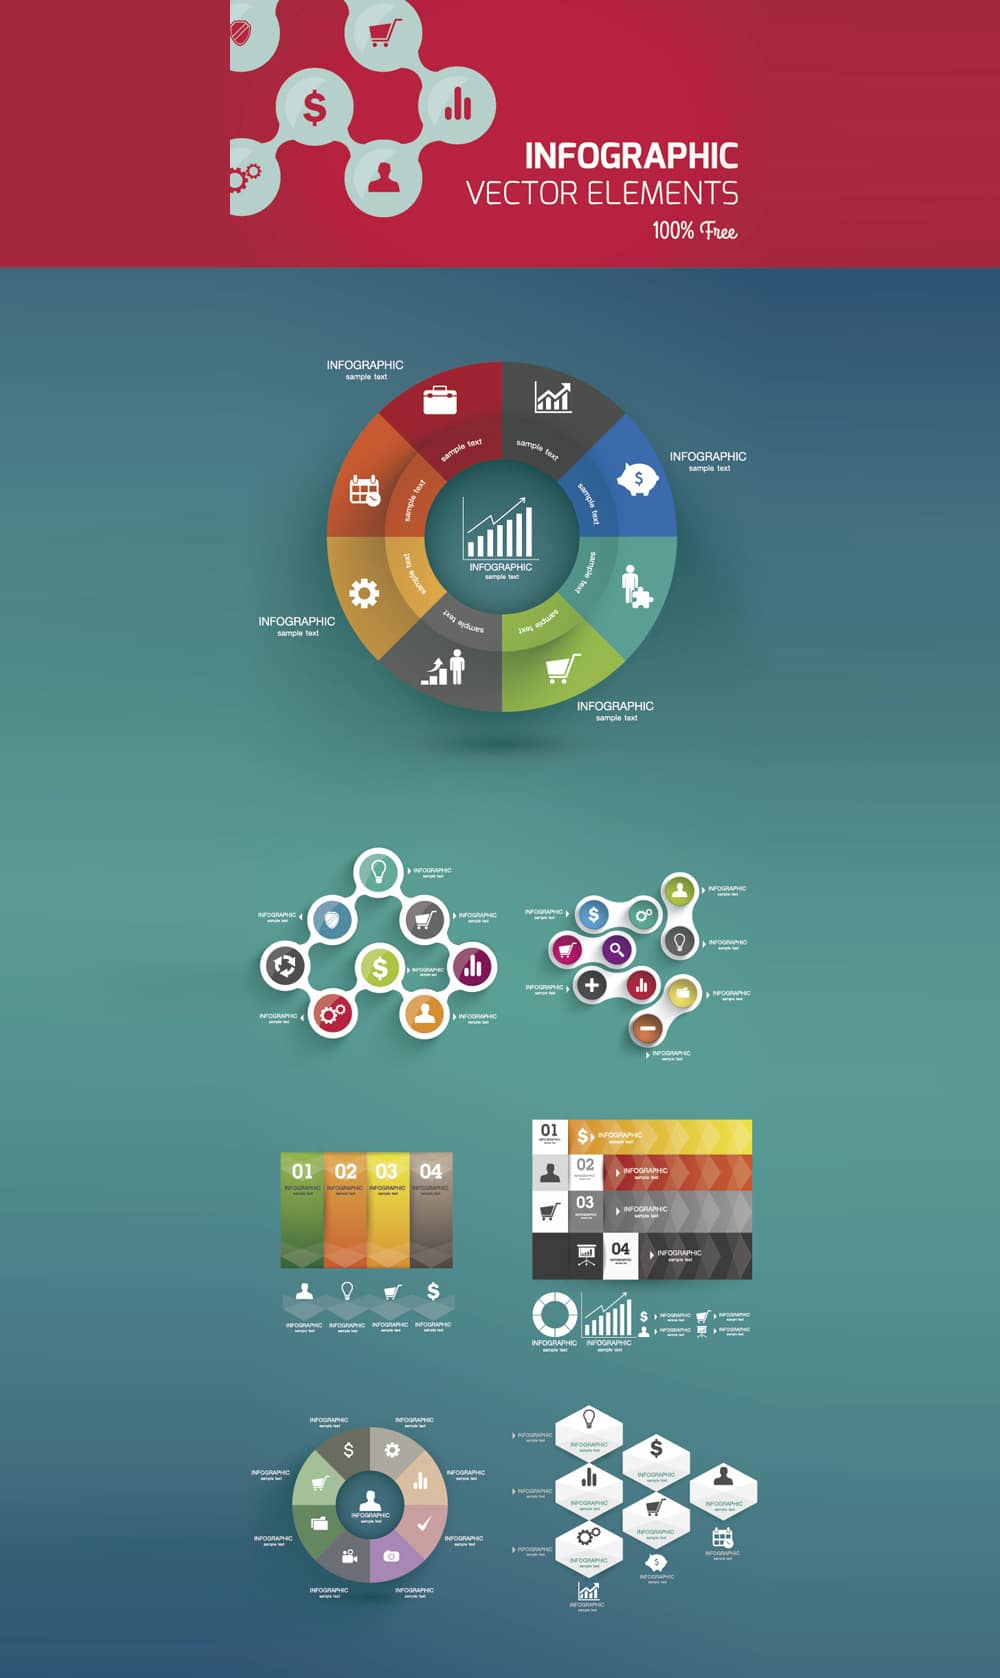 Infographics Ui Design Et Web Design: 25 Best Free Infographic Elements » CSS Author